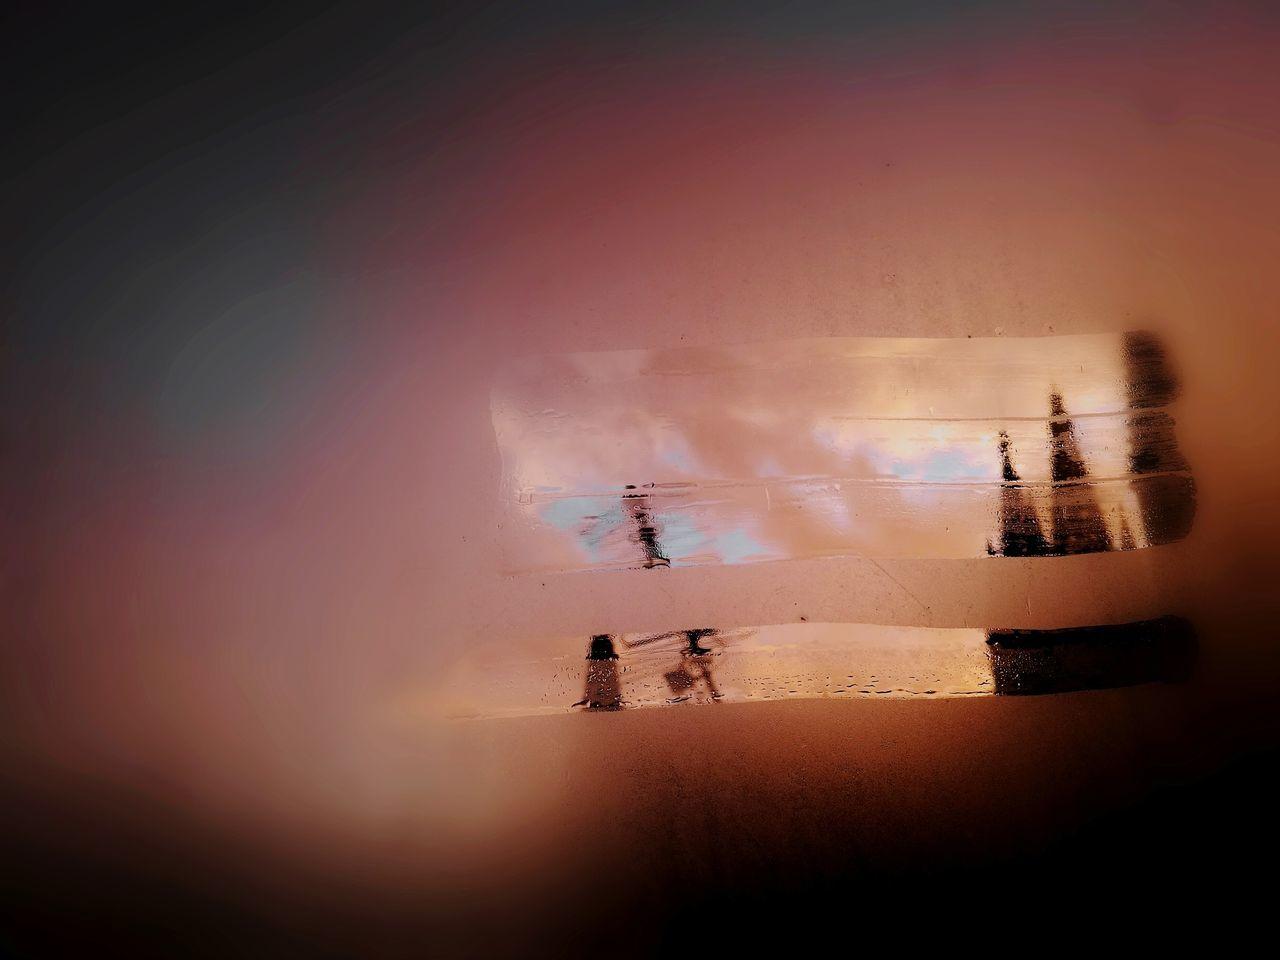 daydreaming Light monument sunset shadow colorful EyeEmNewHere The Week On EyeEm EyeEmNewHere The Week On EyeEm EyeEm Diversity The Secret Spaces Art is Everywhere color explosion colour of life Colors EyeEm Best Edits EyeEm Nature Lover break the mold TCPM The Street Photographer - 2017 EyeEm Awards The Architect - 2017 EyeEm Awards Neighborhood Map burgos cathedral Burgos SPAIN BYOPaper! Live for the Story The Great Outdoors - 2017 EyeEm Awards The Photojournalist - 2017 EyeEm Awards